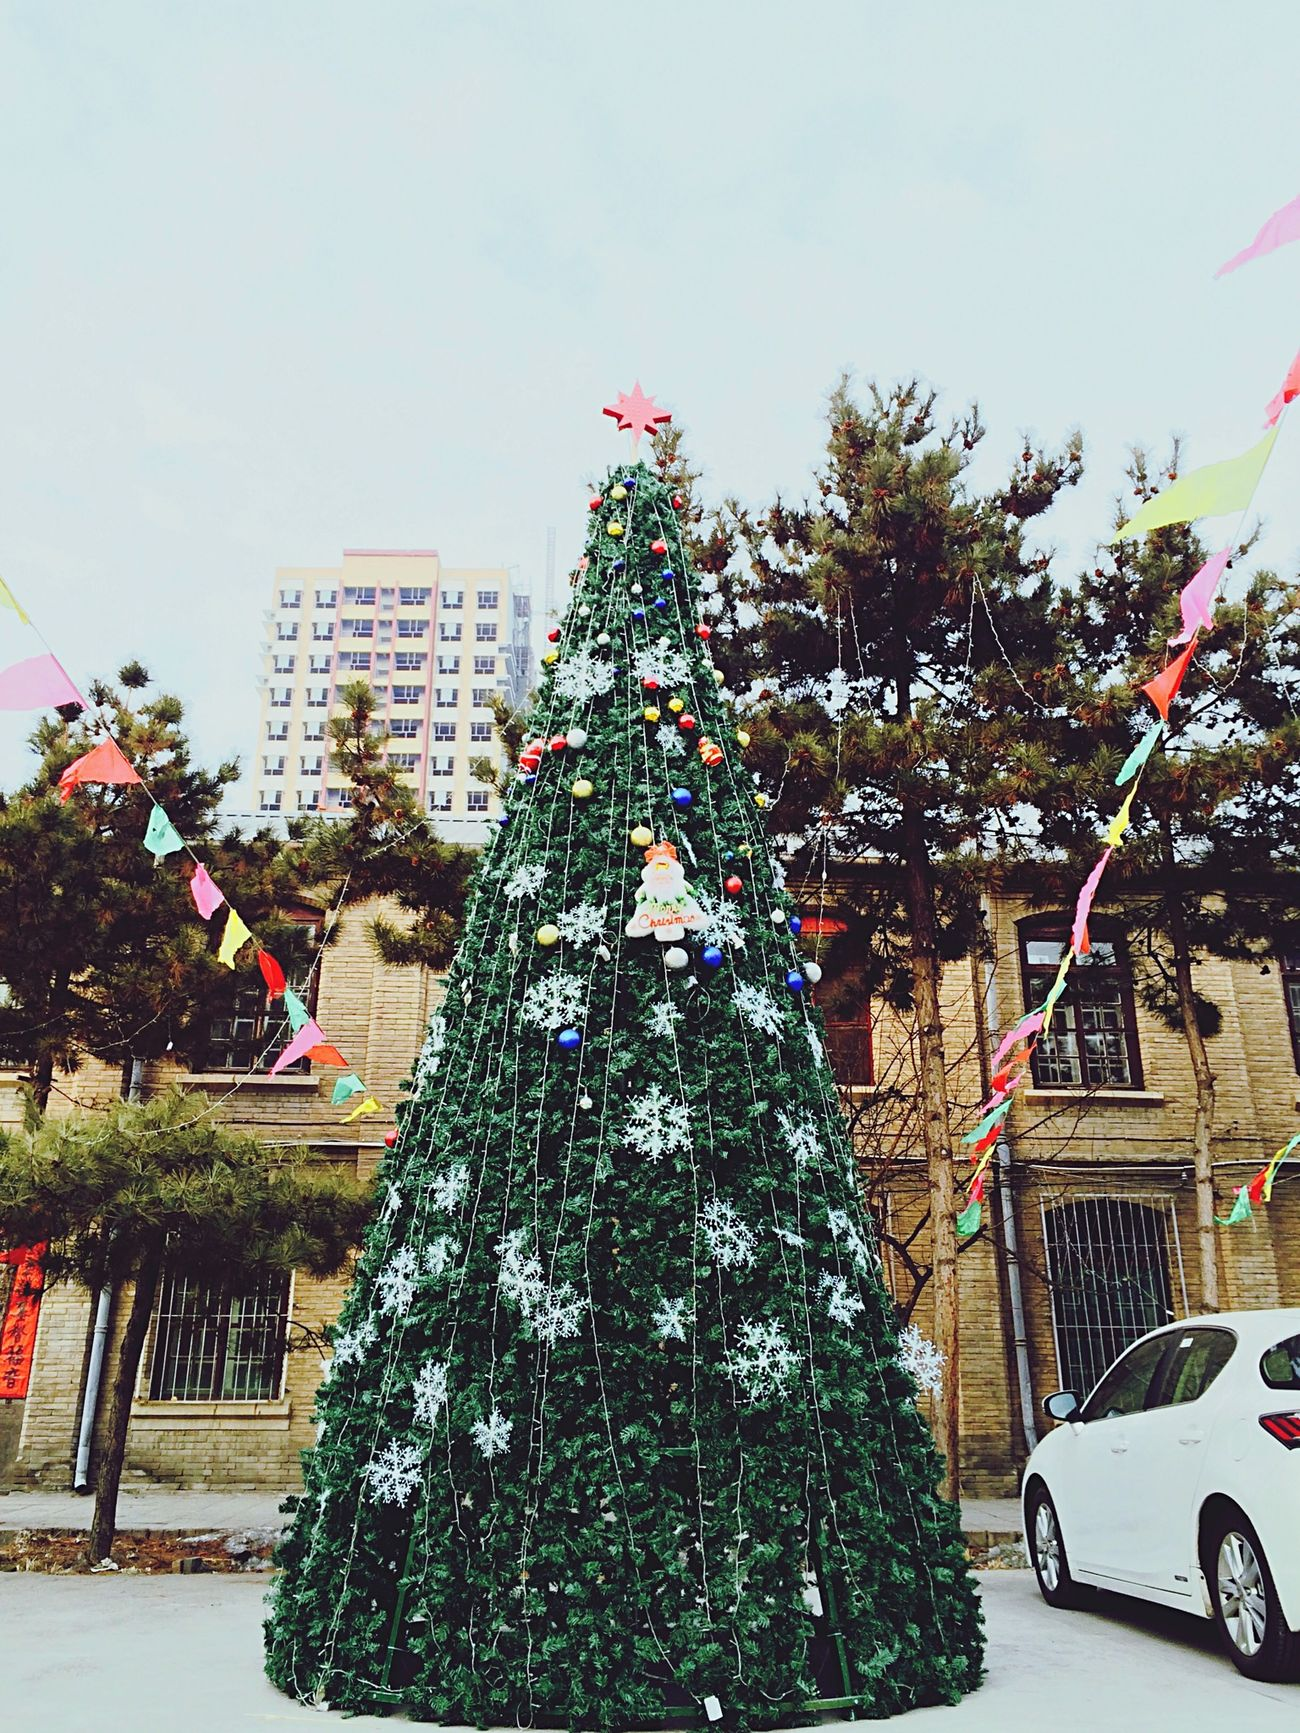 Christmas Around The World Christmas Tree Christmastime Christmas Decorations MerryChristmas